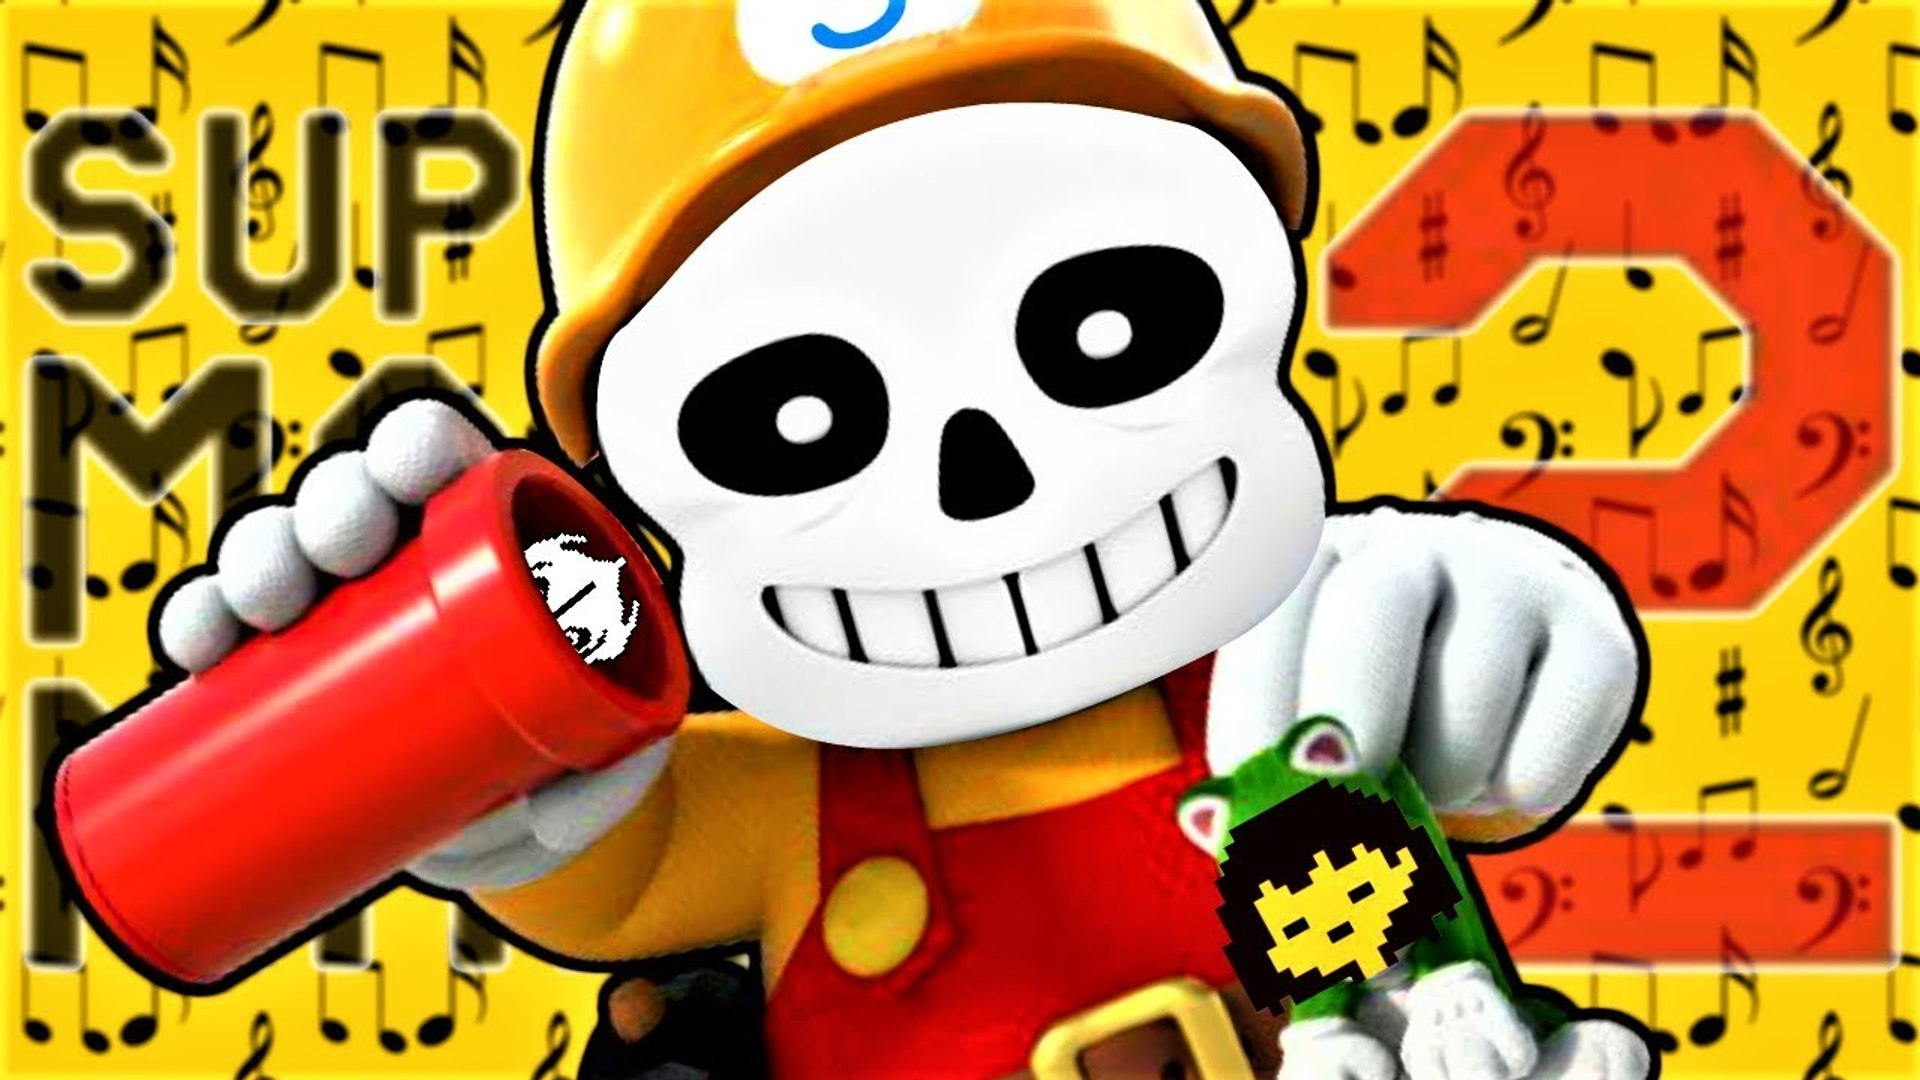 UNDERTALE MUSIC LEVELS in SUPER MARIO MAKER 2